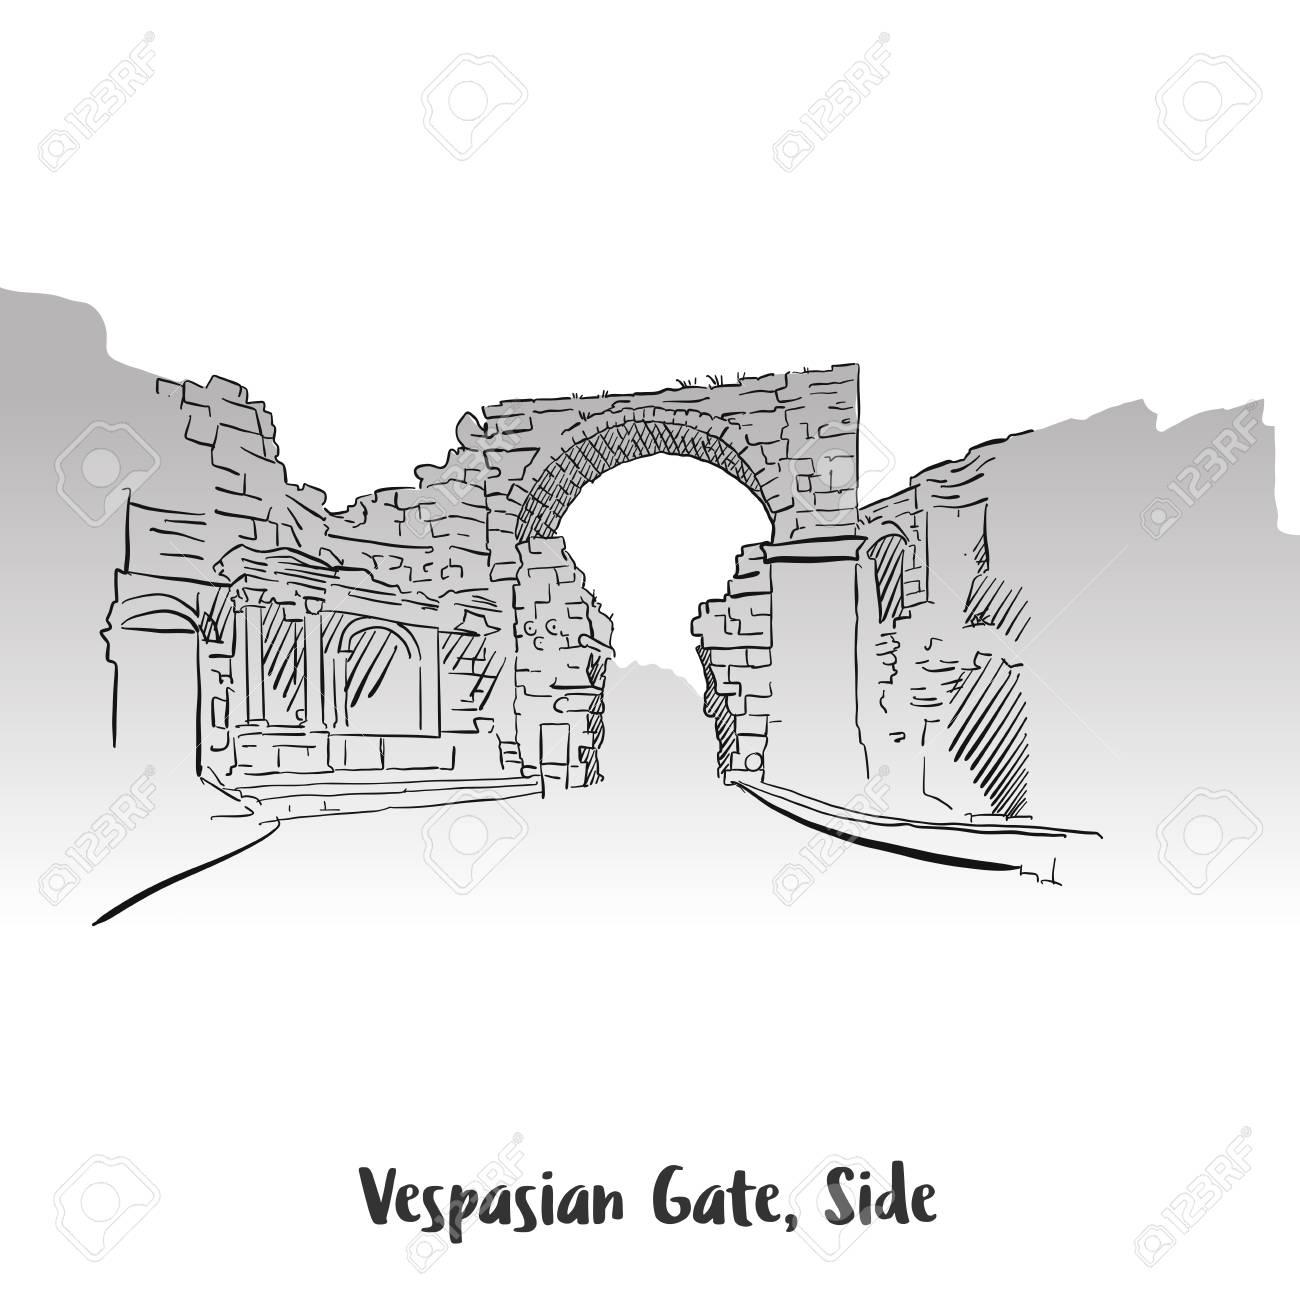 vaspasian gate side print design hand drawn vector outline rh 123rf com Fence Vector Fence Vector